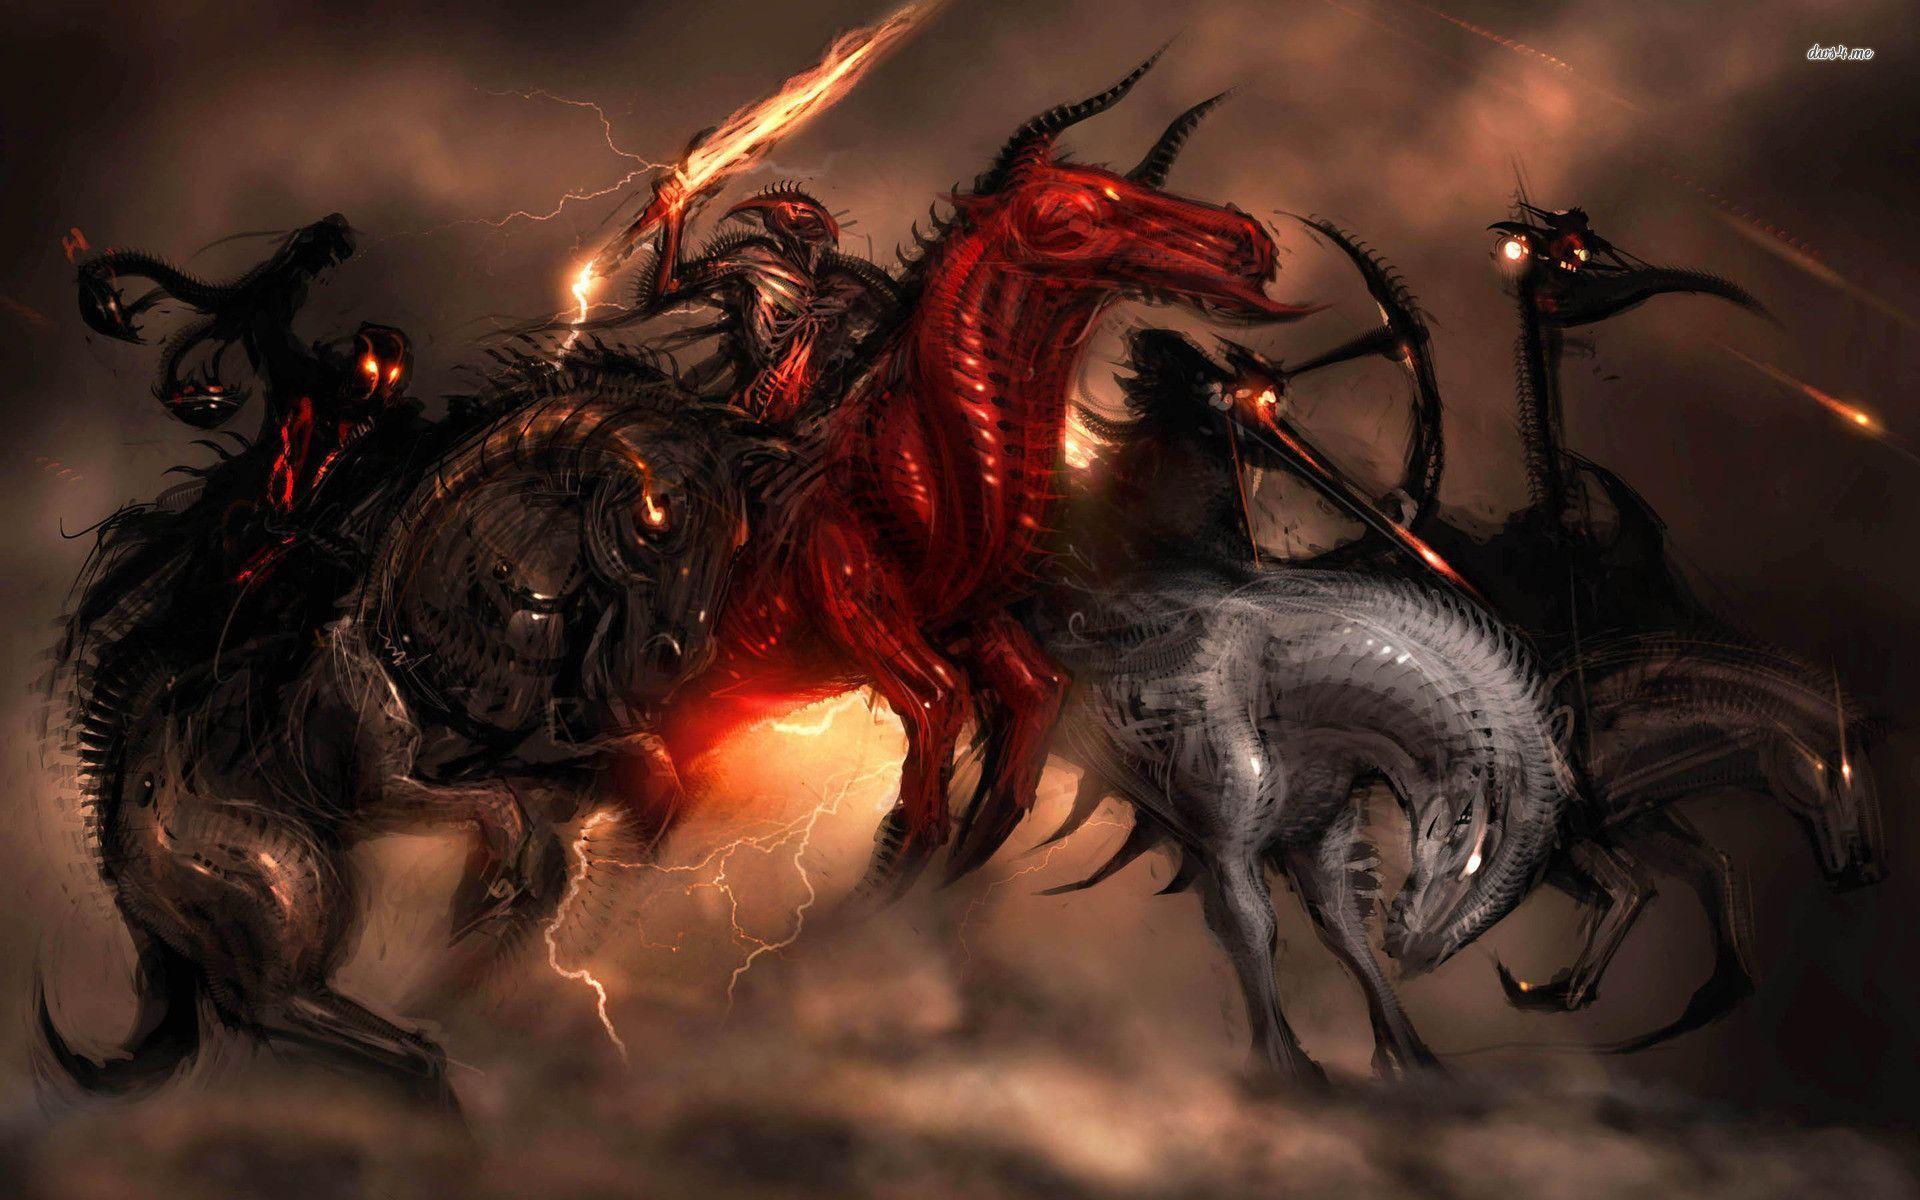 The Four Horsemen Of The Apocalypse Wallpapers Wallpaper